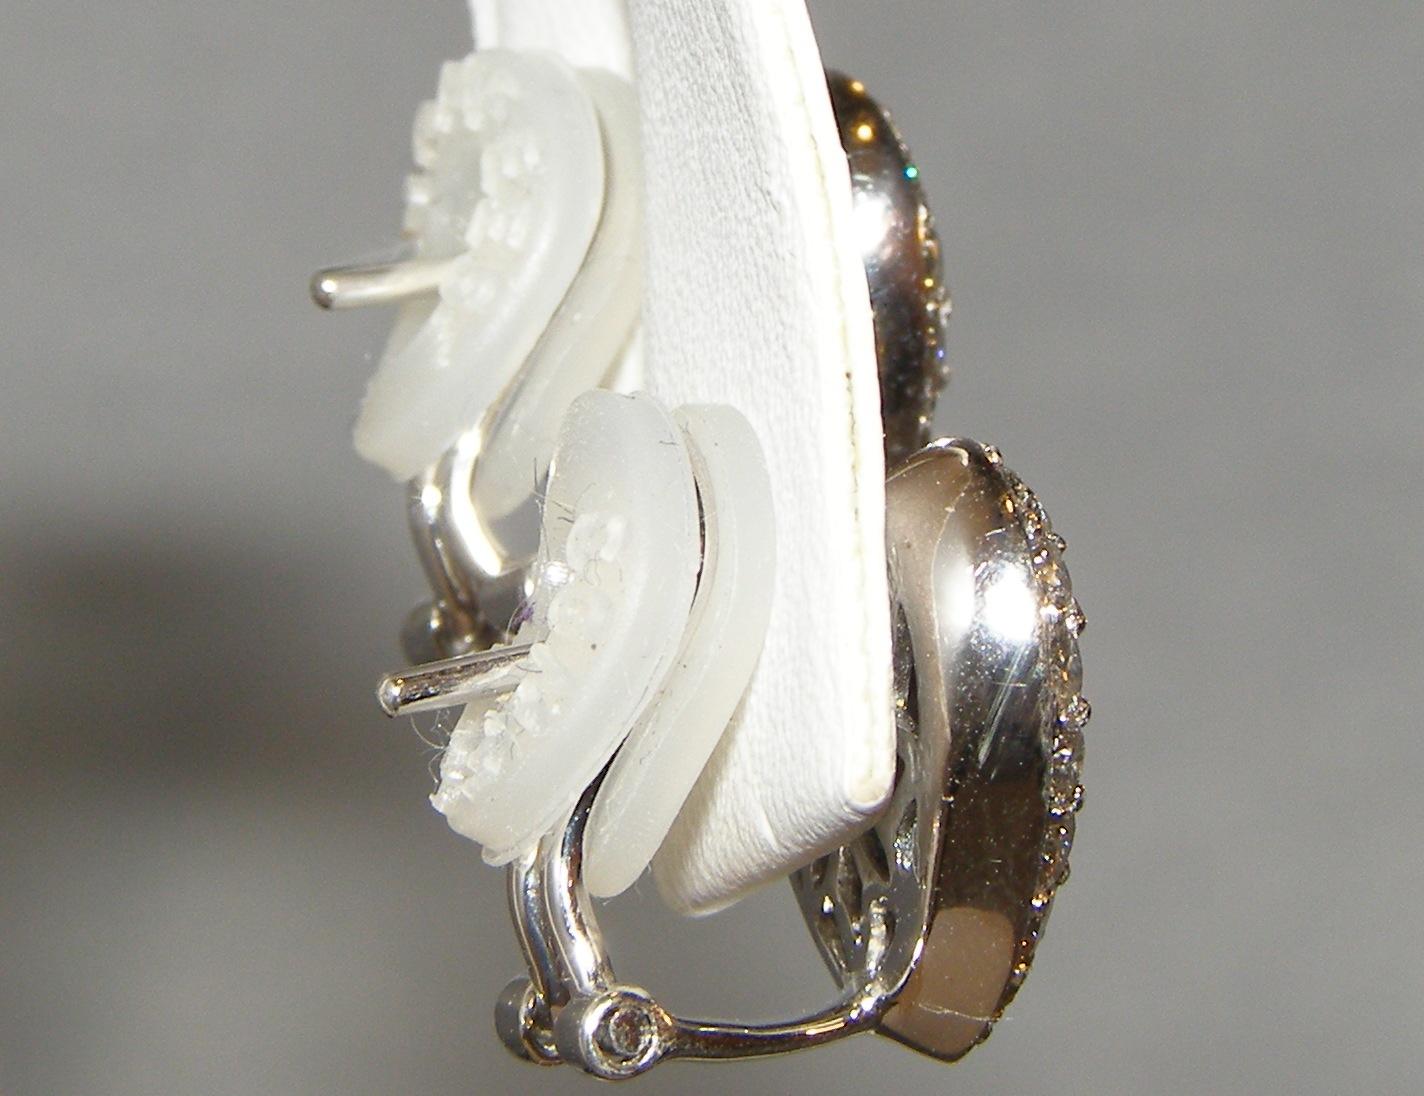 Pave Bright Blue Sapphire Diamond Earrings 18KWG 2.02 ctw